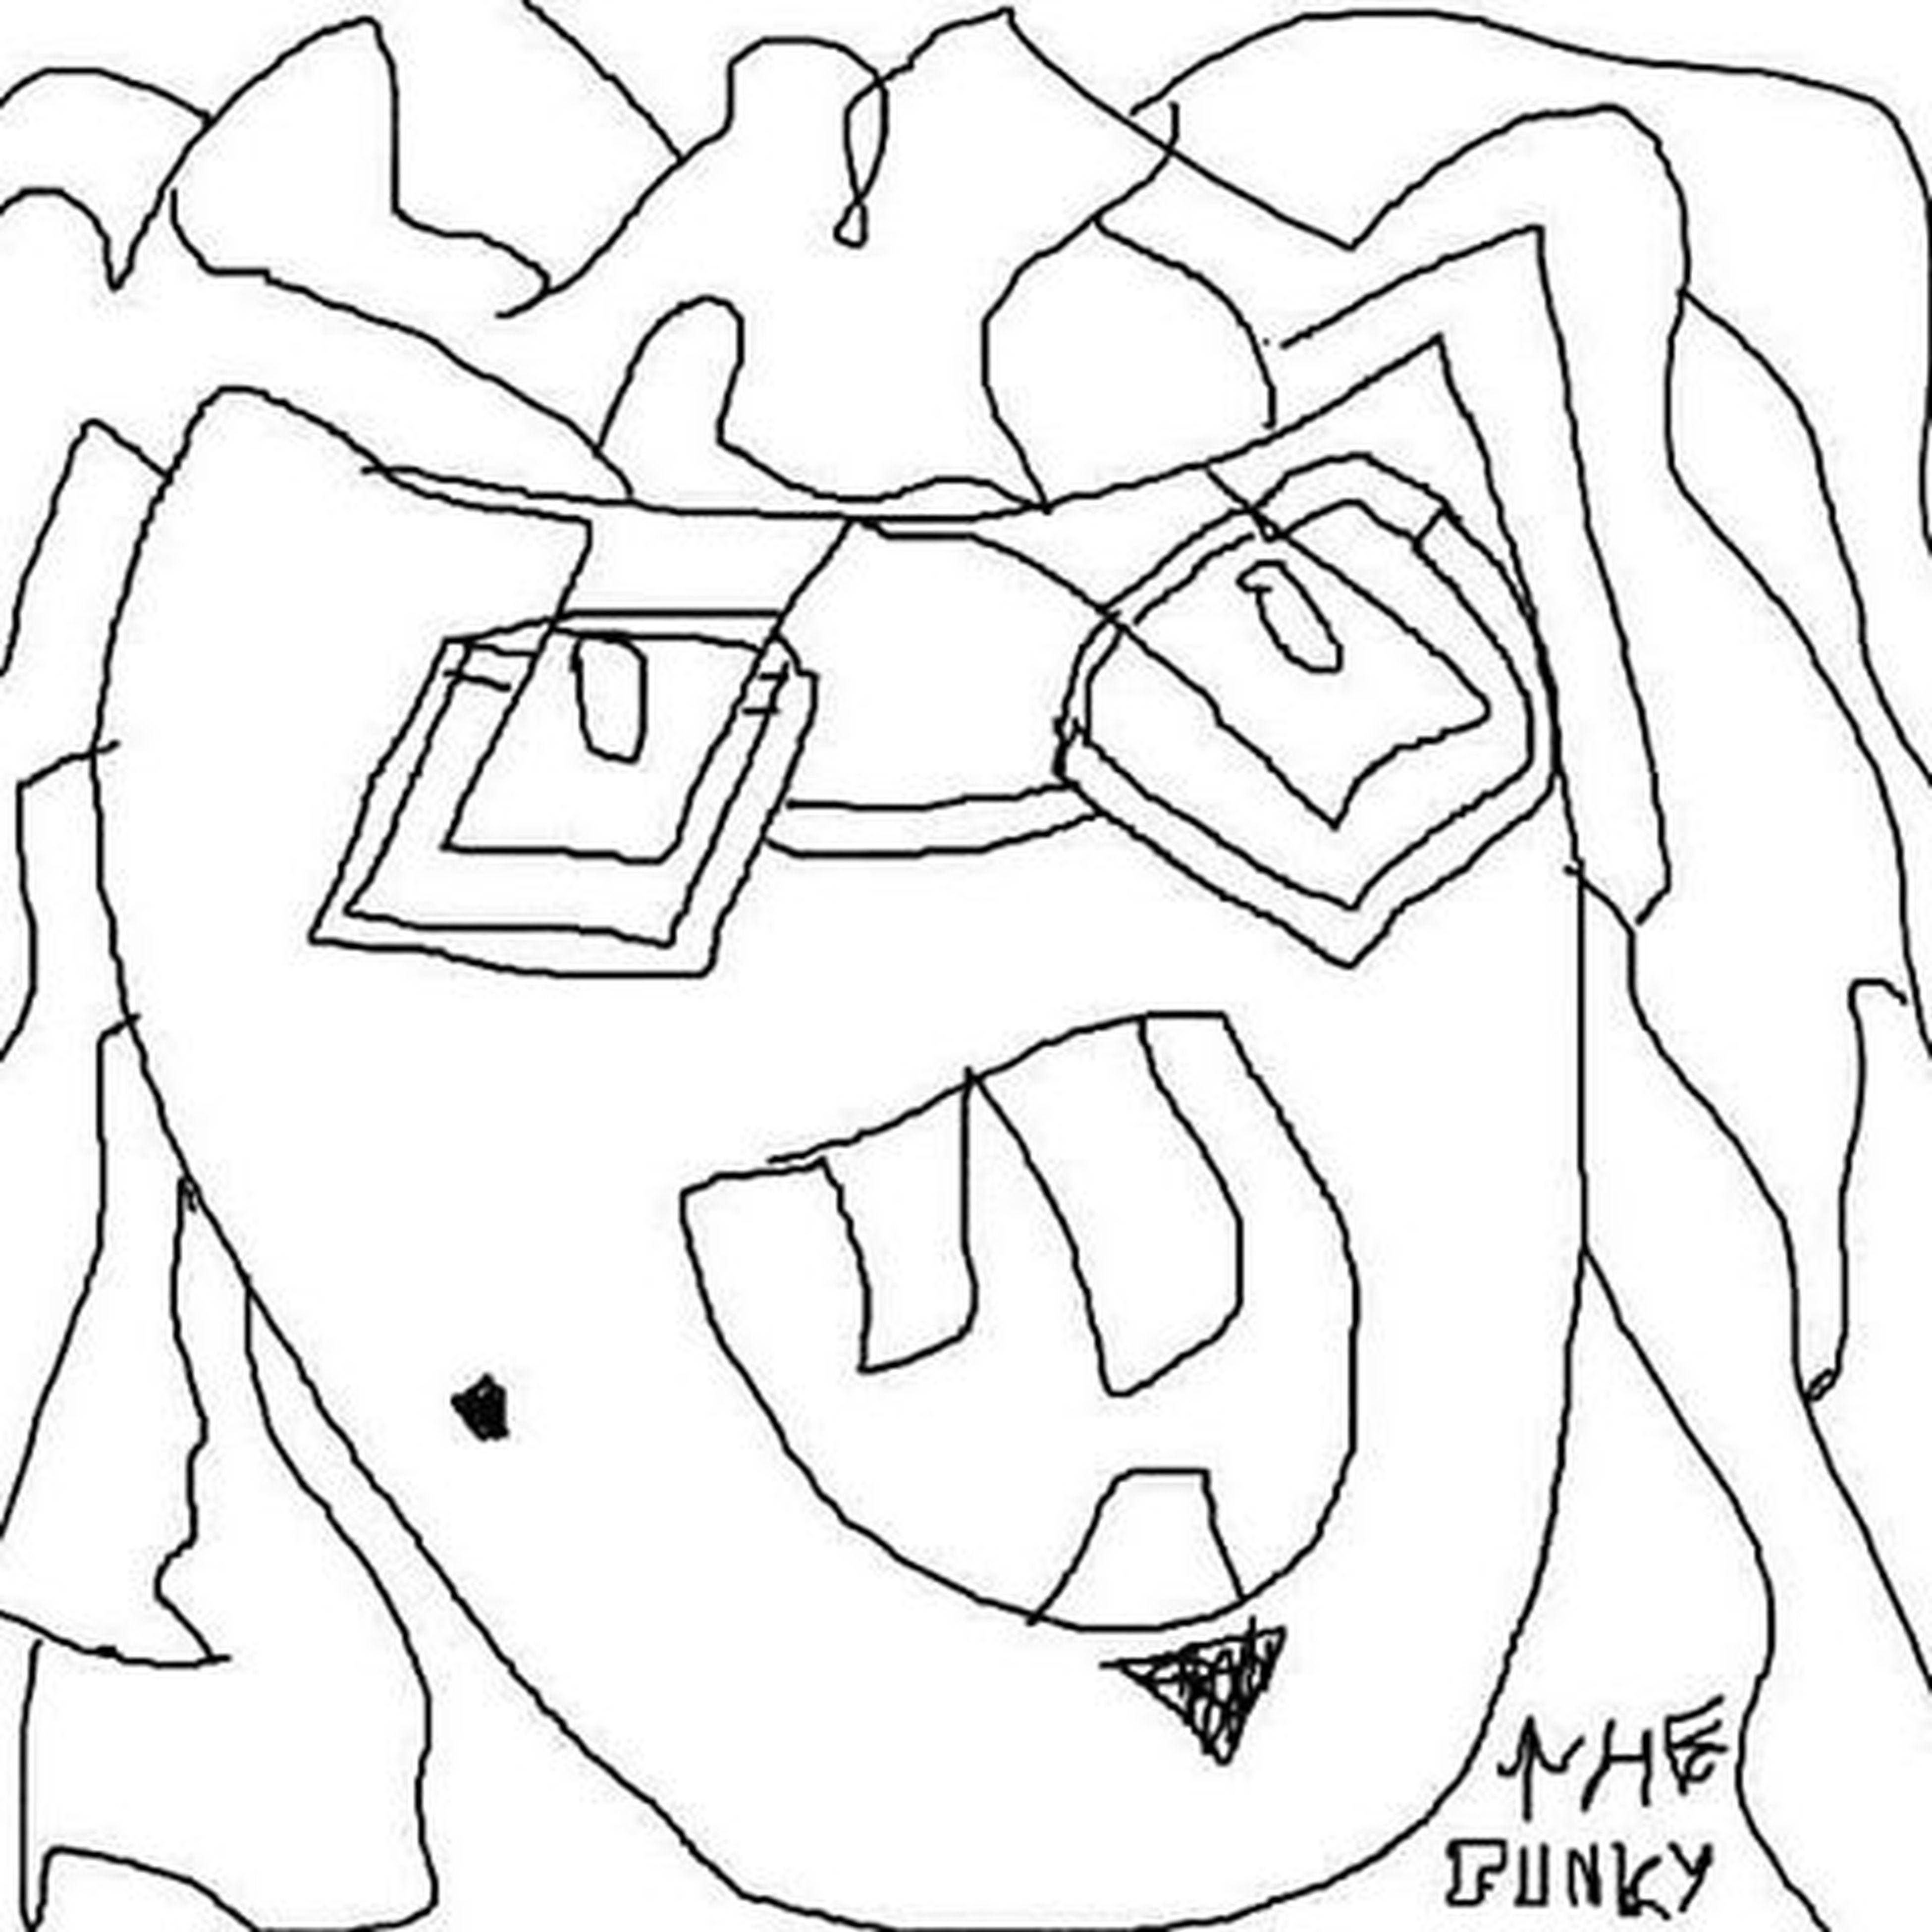 text, communication, creativity, western script, art, art and craft, close-up, graffiti, full frame, ideas, capital letter, backgrounds, design, human representation, pattern, wall - building feature, indoors, paper, love, studio shot